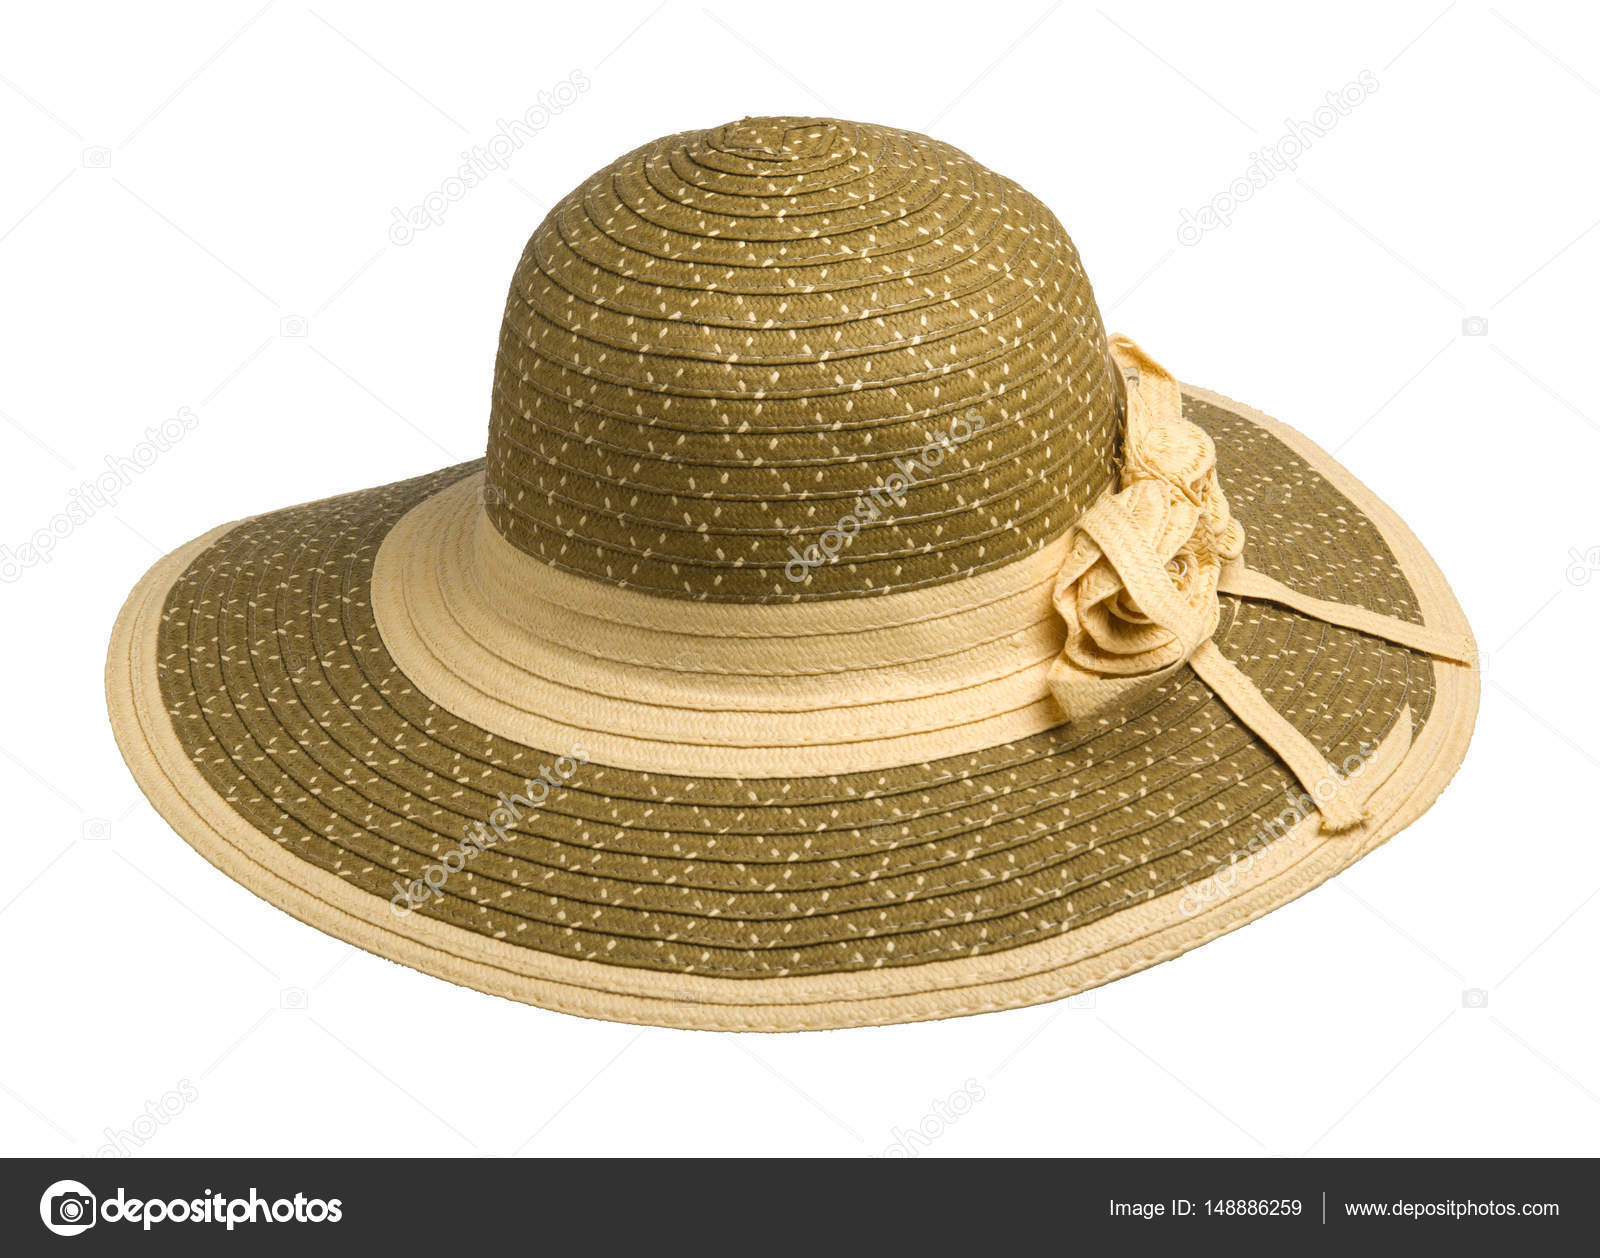 49c6c58ae7 Γυναίκα καπέλο που απομονώνονται σε λευκό φόντο. Παραλία καπέλο των γυναικών.  πολύχρωμο καπέλο — Εικόνα από ...